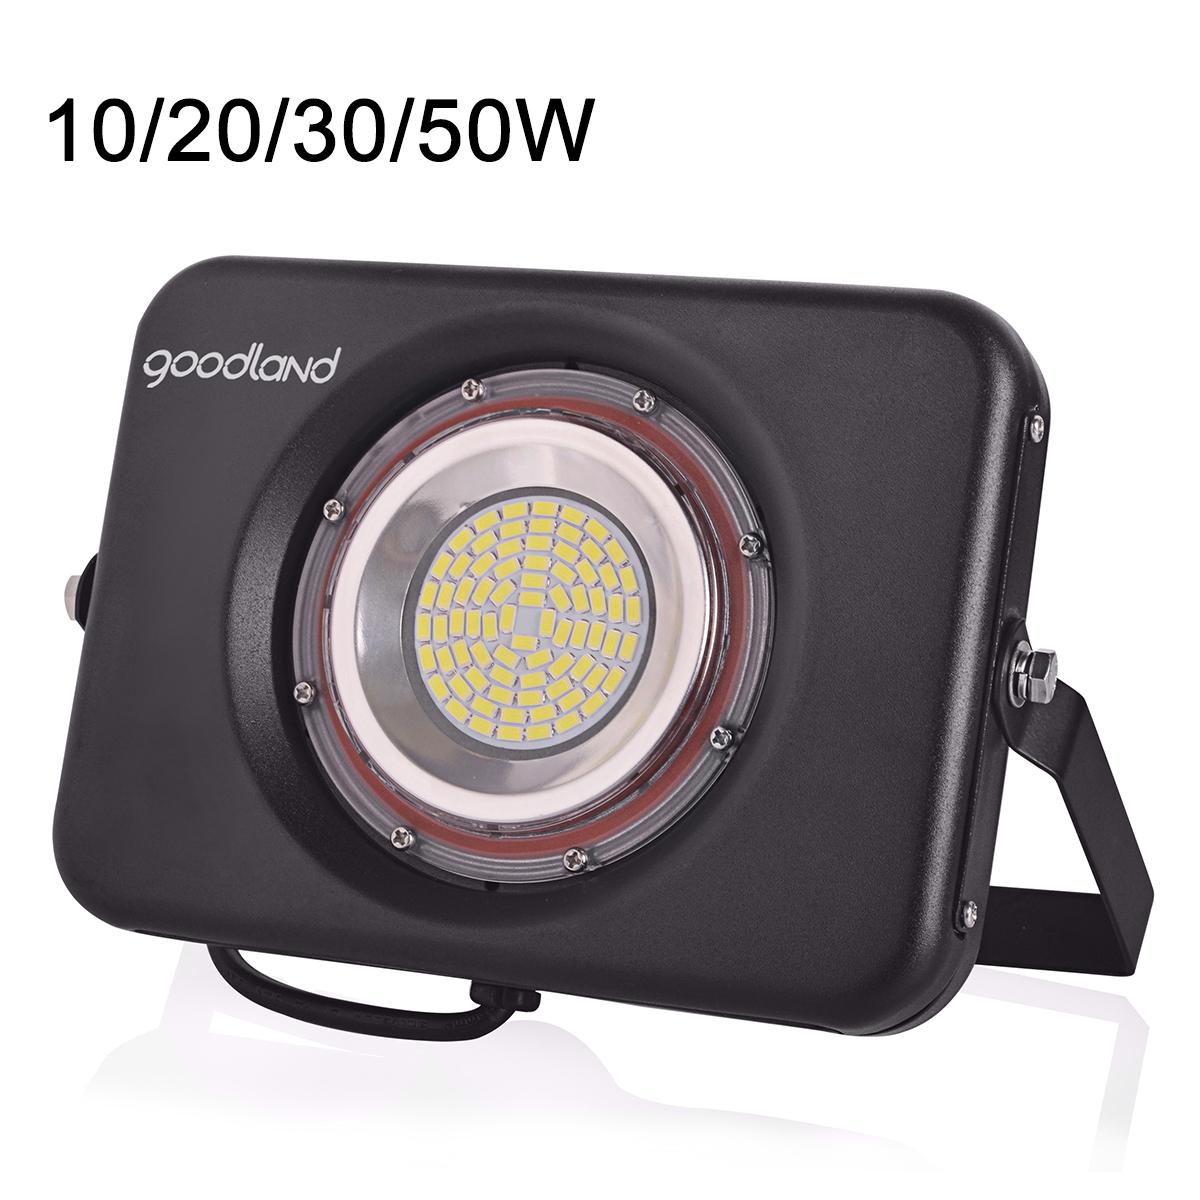 30w Led Flood Lights In Dubai Outdoor Lighting: NEW Reflector LED Flood Light 220V LED Outdoor Spotlight